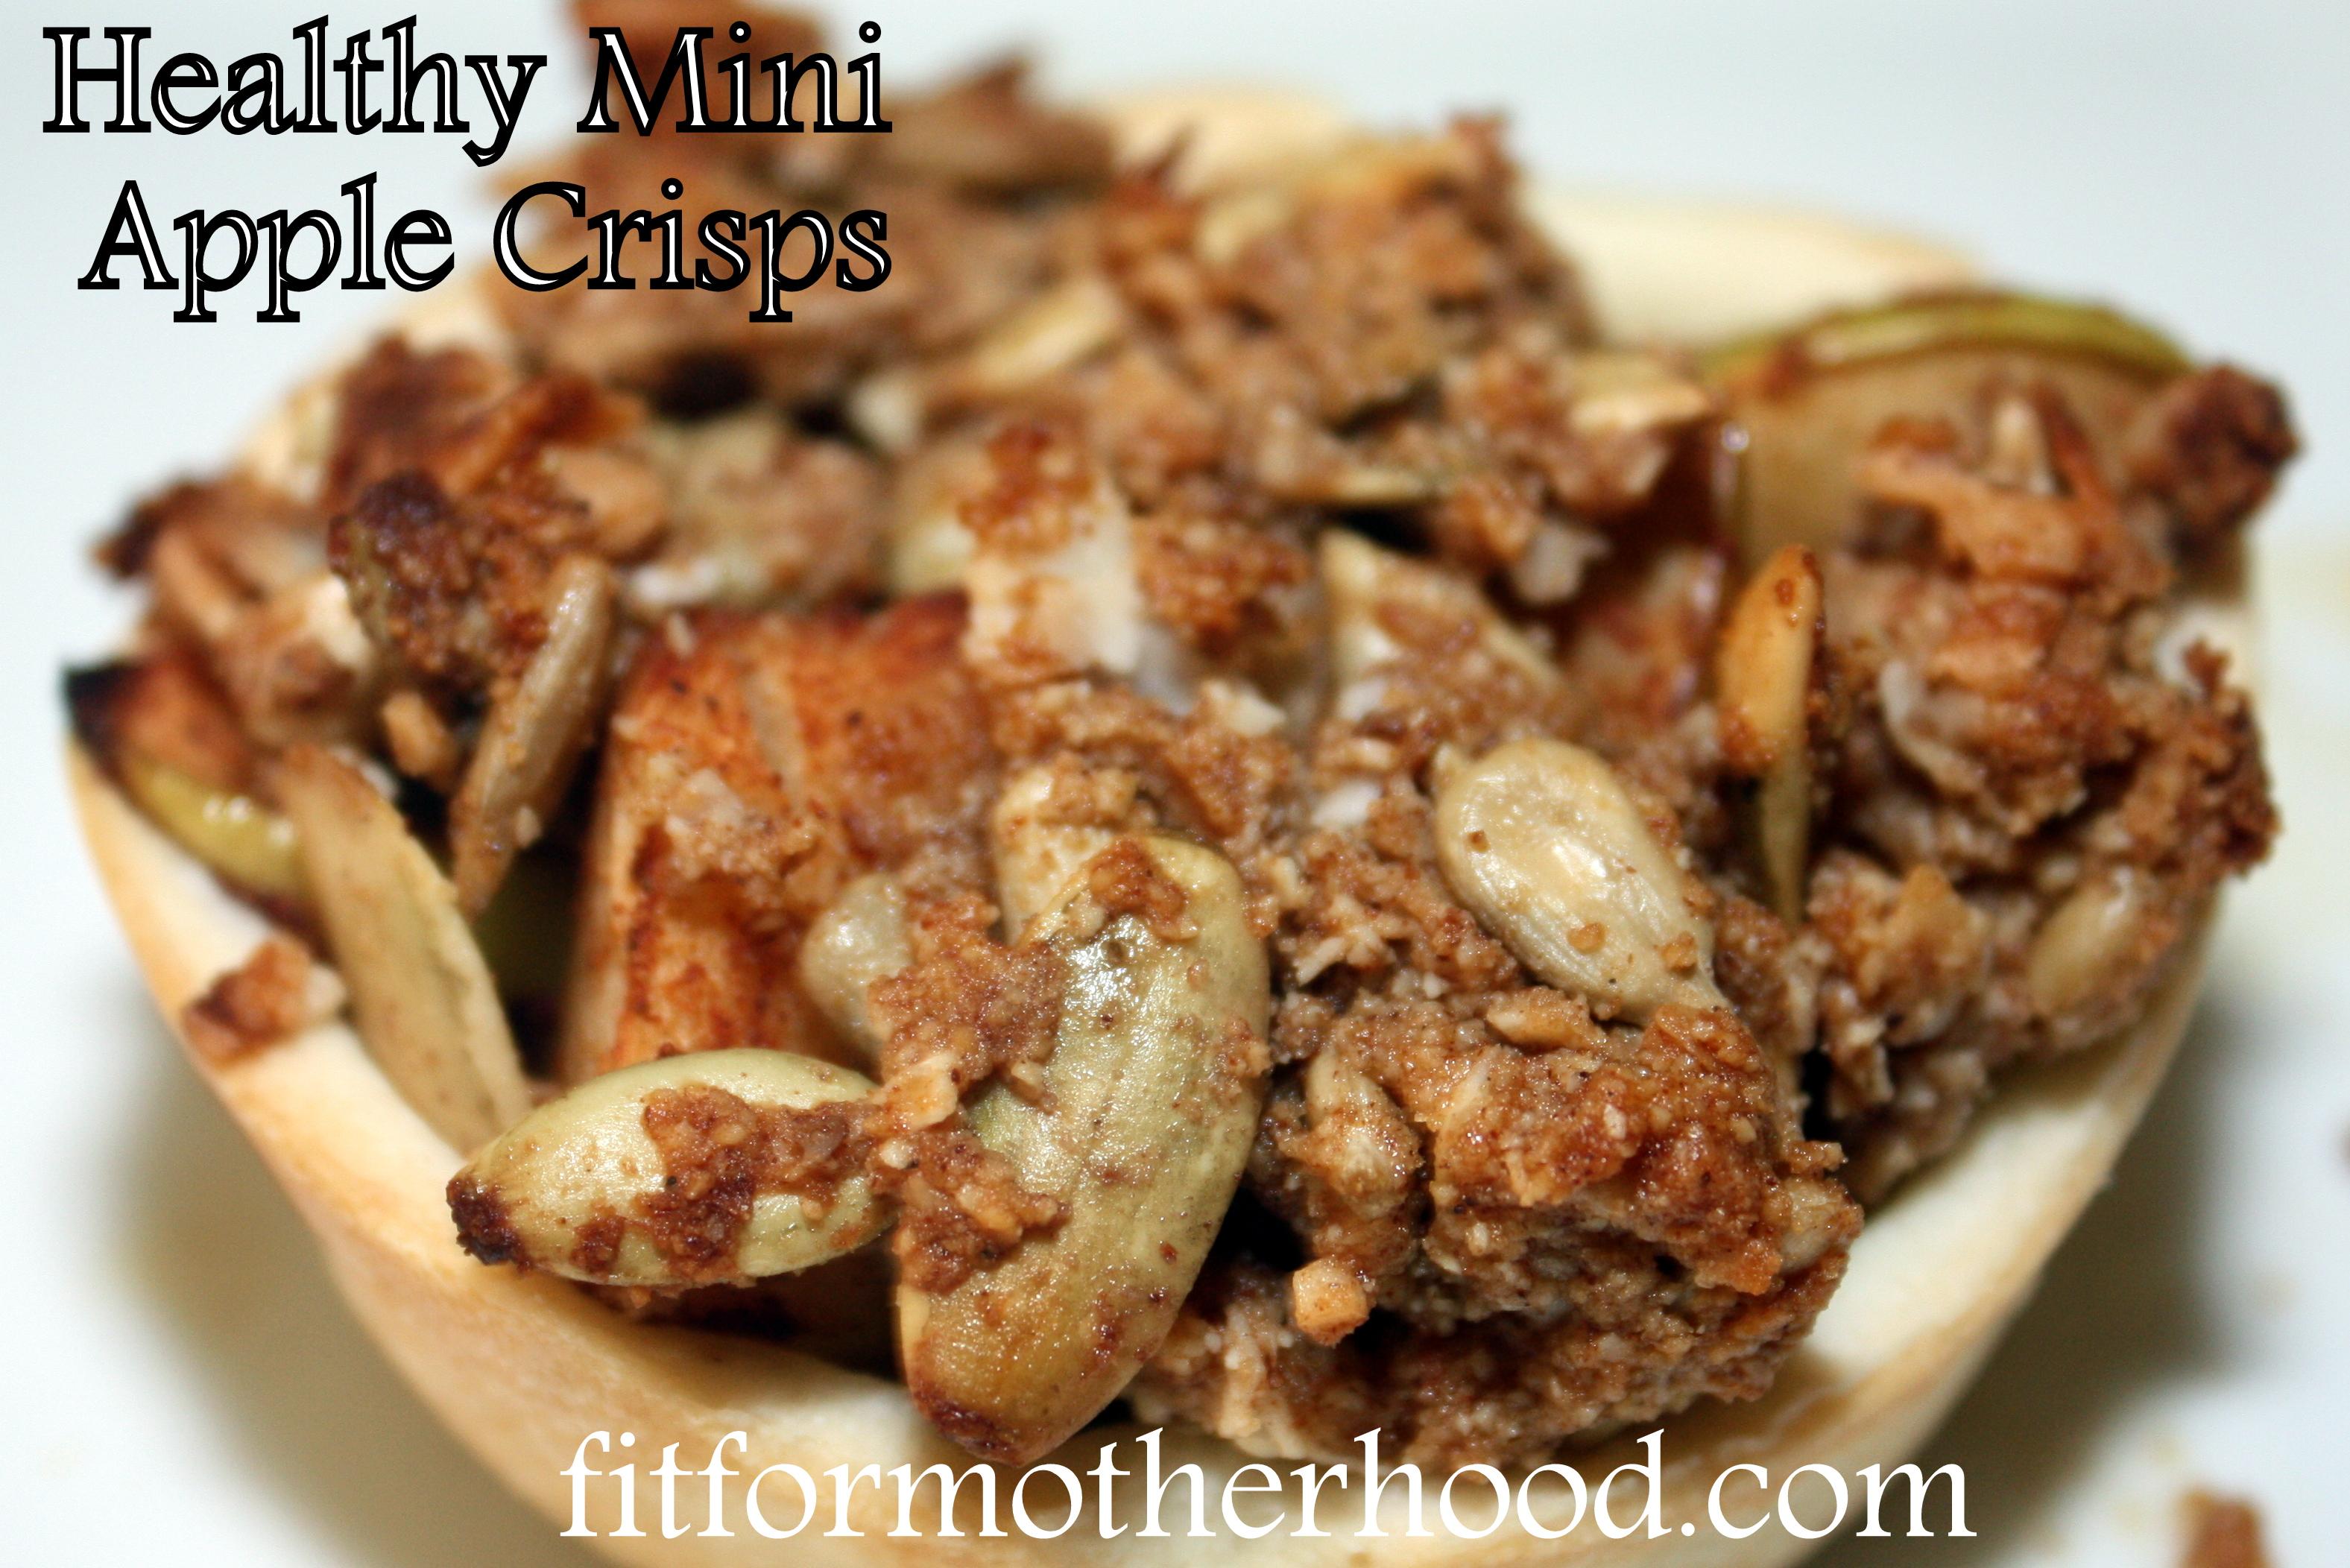 Easy Healthy Mini Apple Crisps